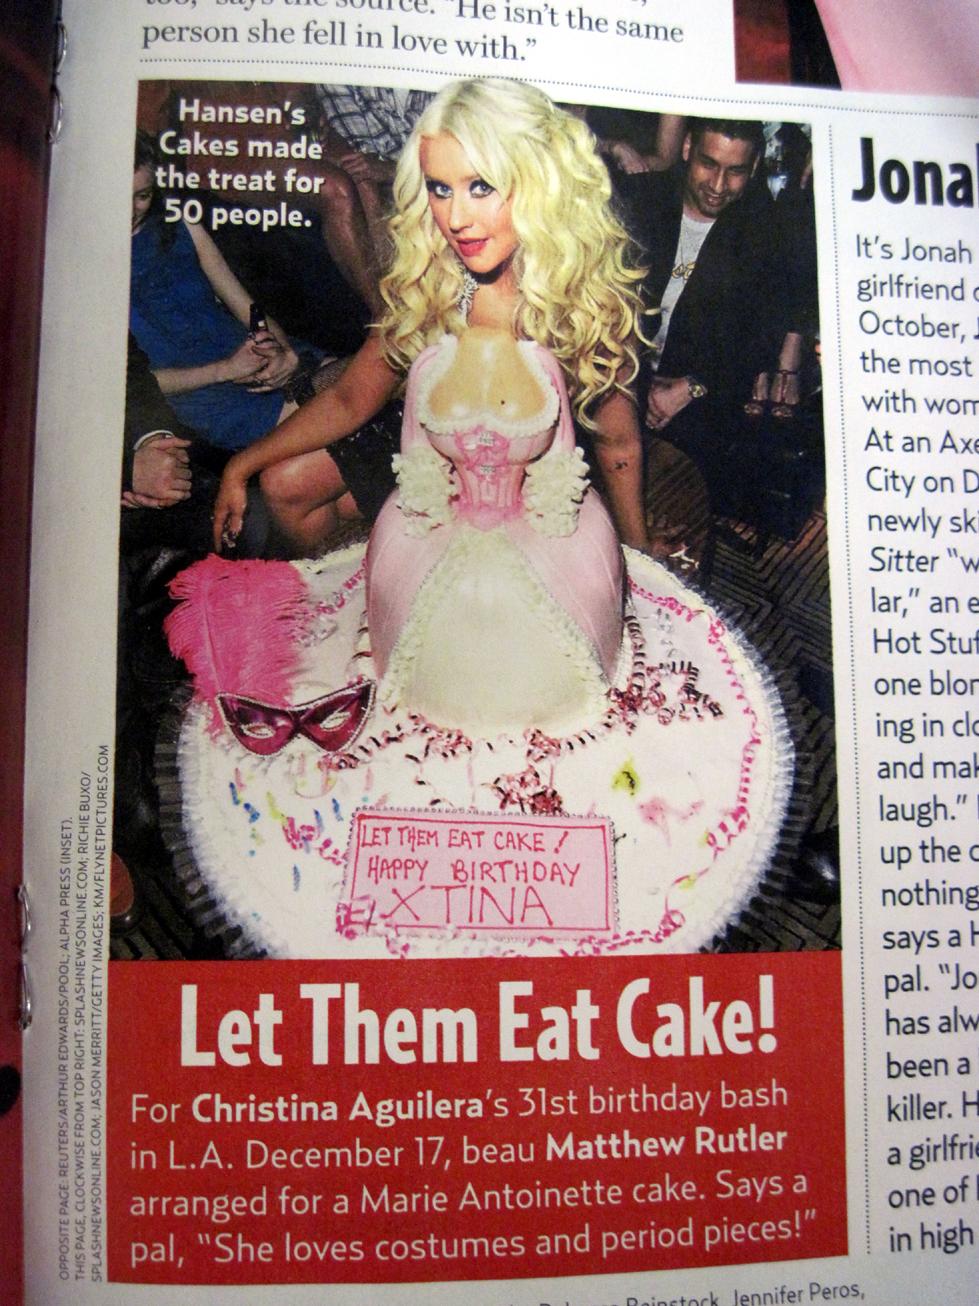 Movie Cake With Heather Graham